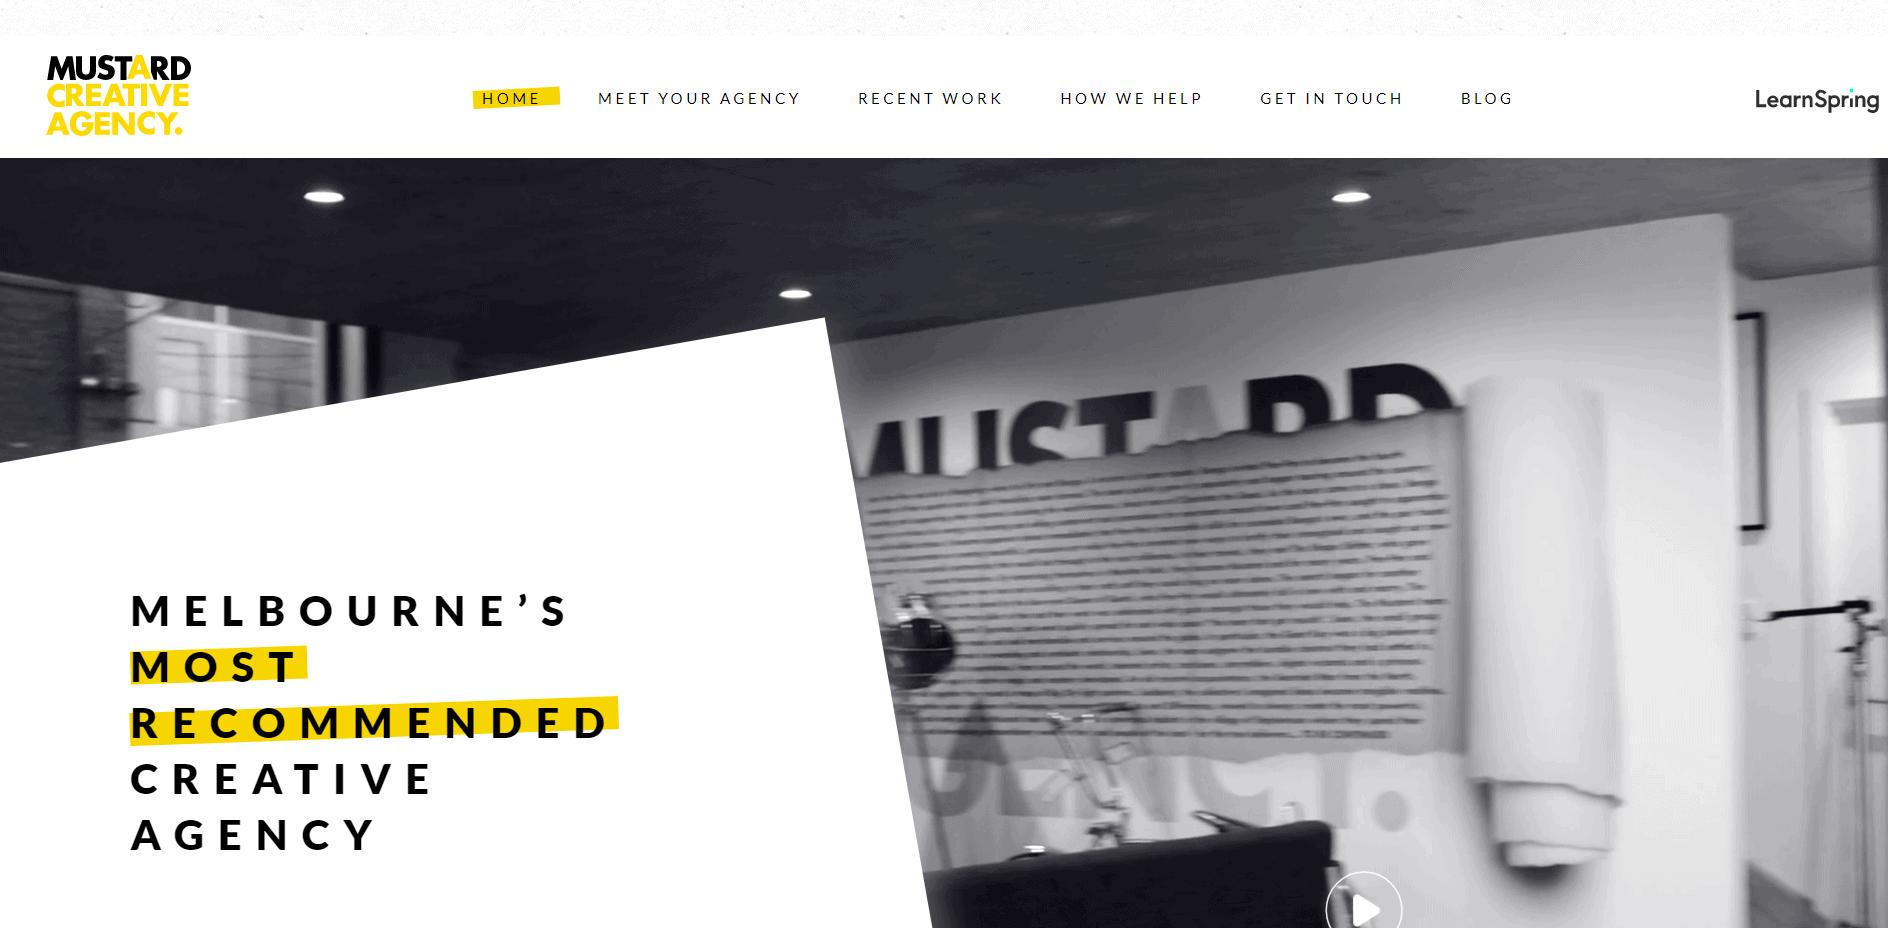 mustard creative agency